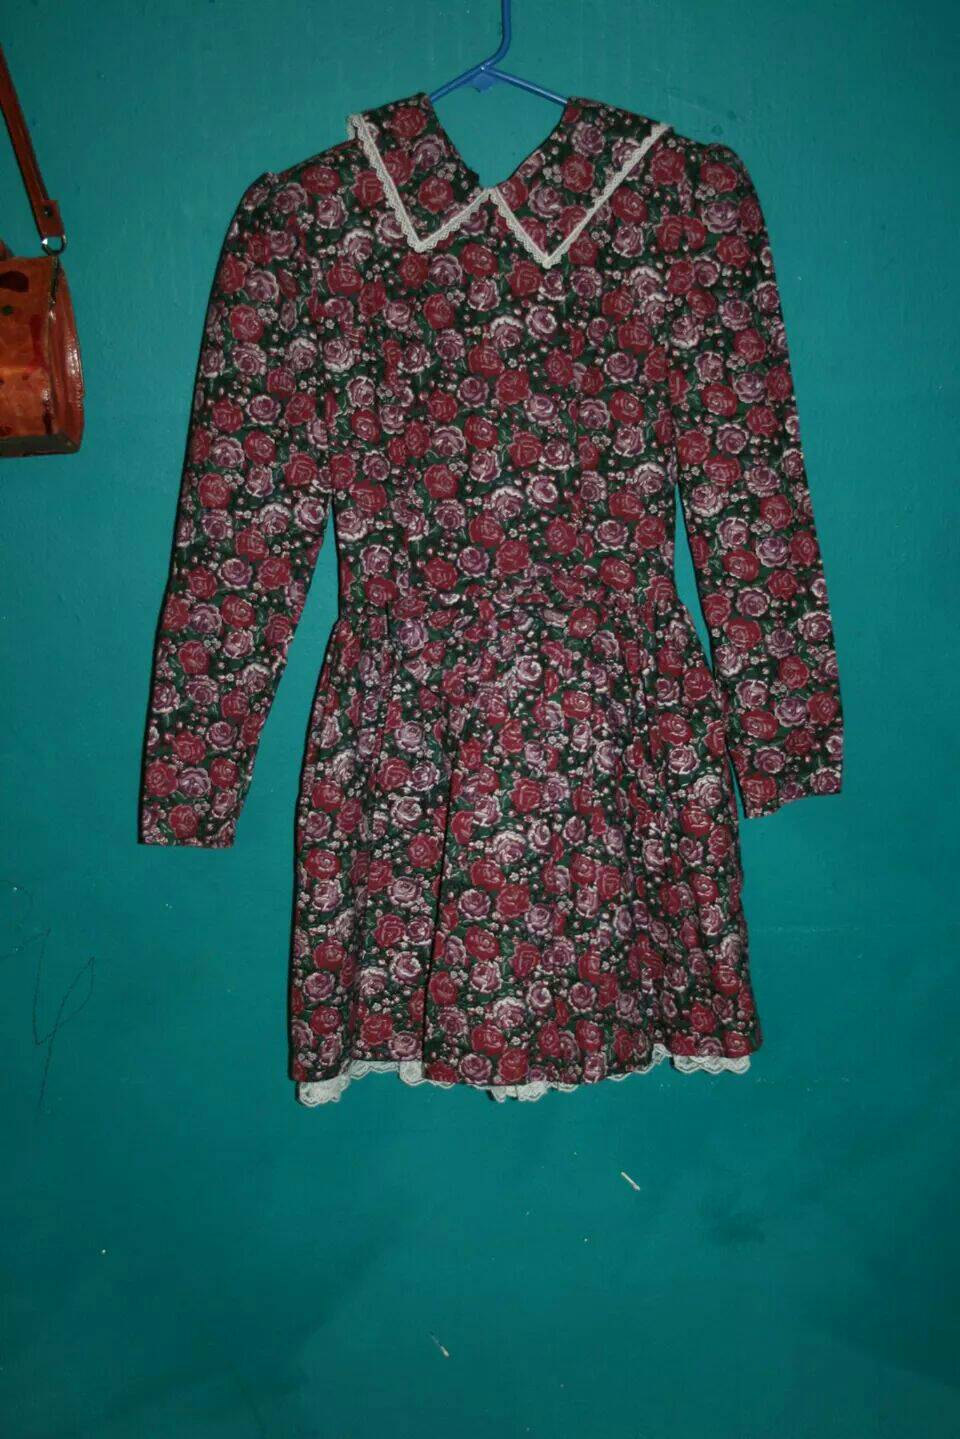 Gunne sax lolita rose print mini dress w peter pan collar / vintage mini dress / floral peterpan collar dress